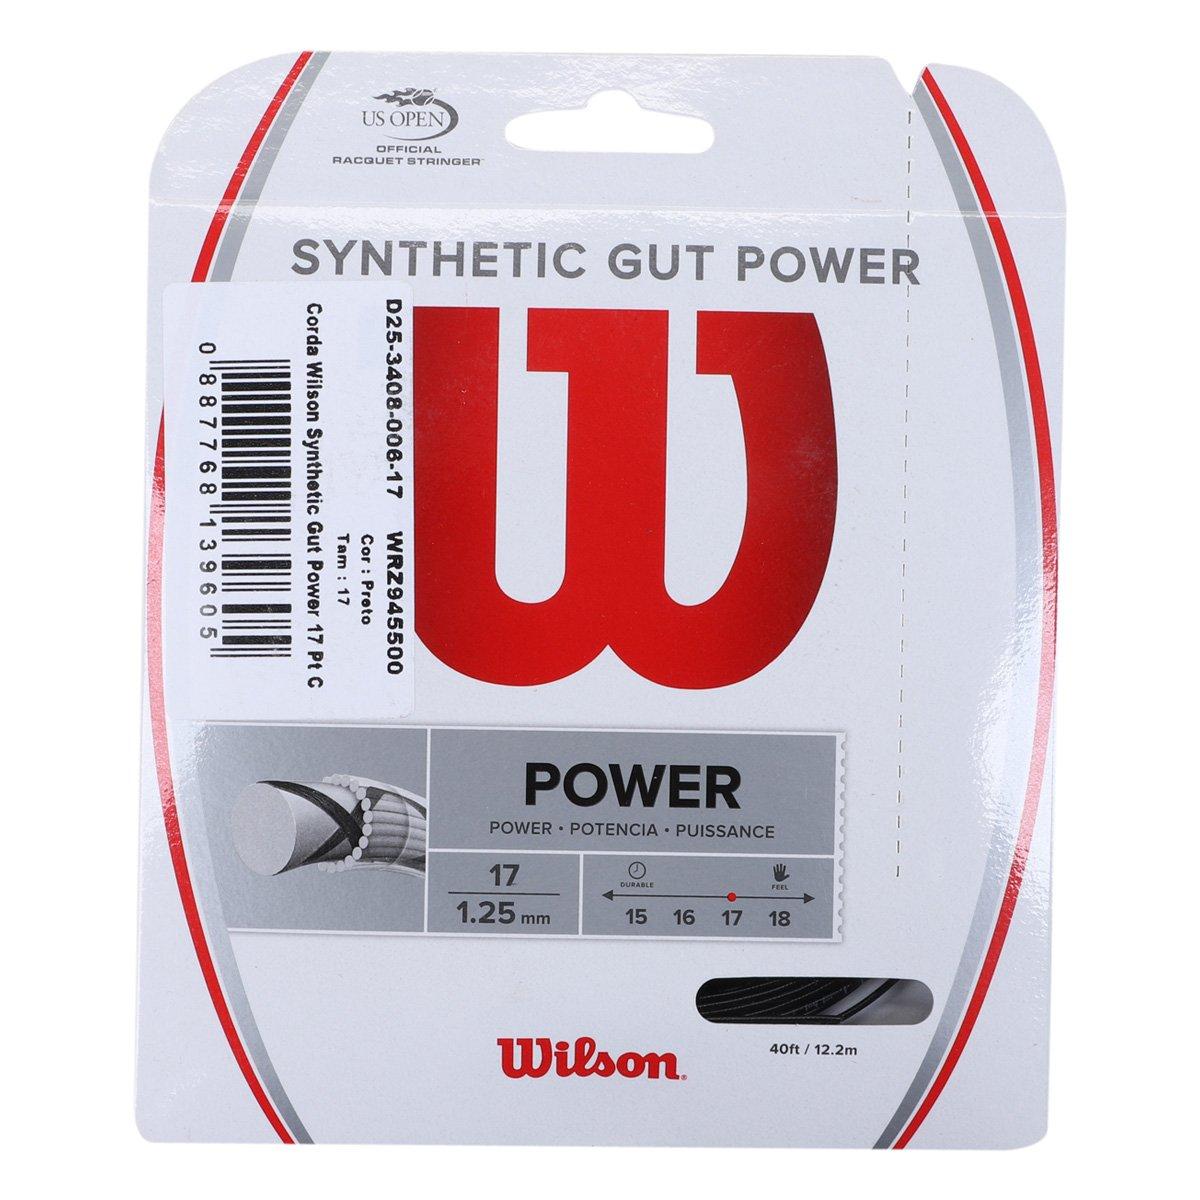 Corda Wilson Synthetic Gut Power 17 Pt Cartela